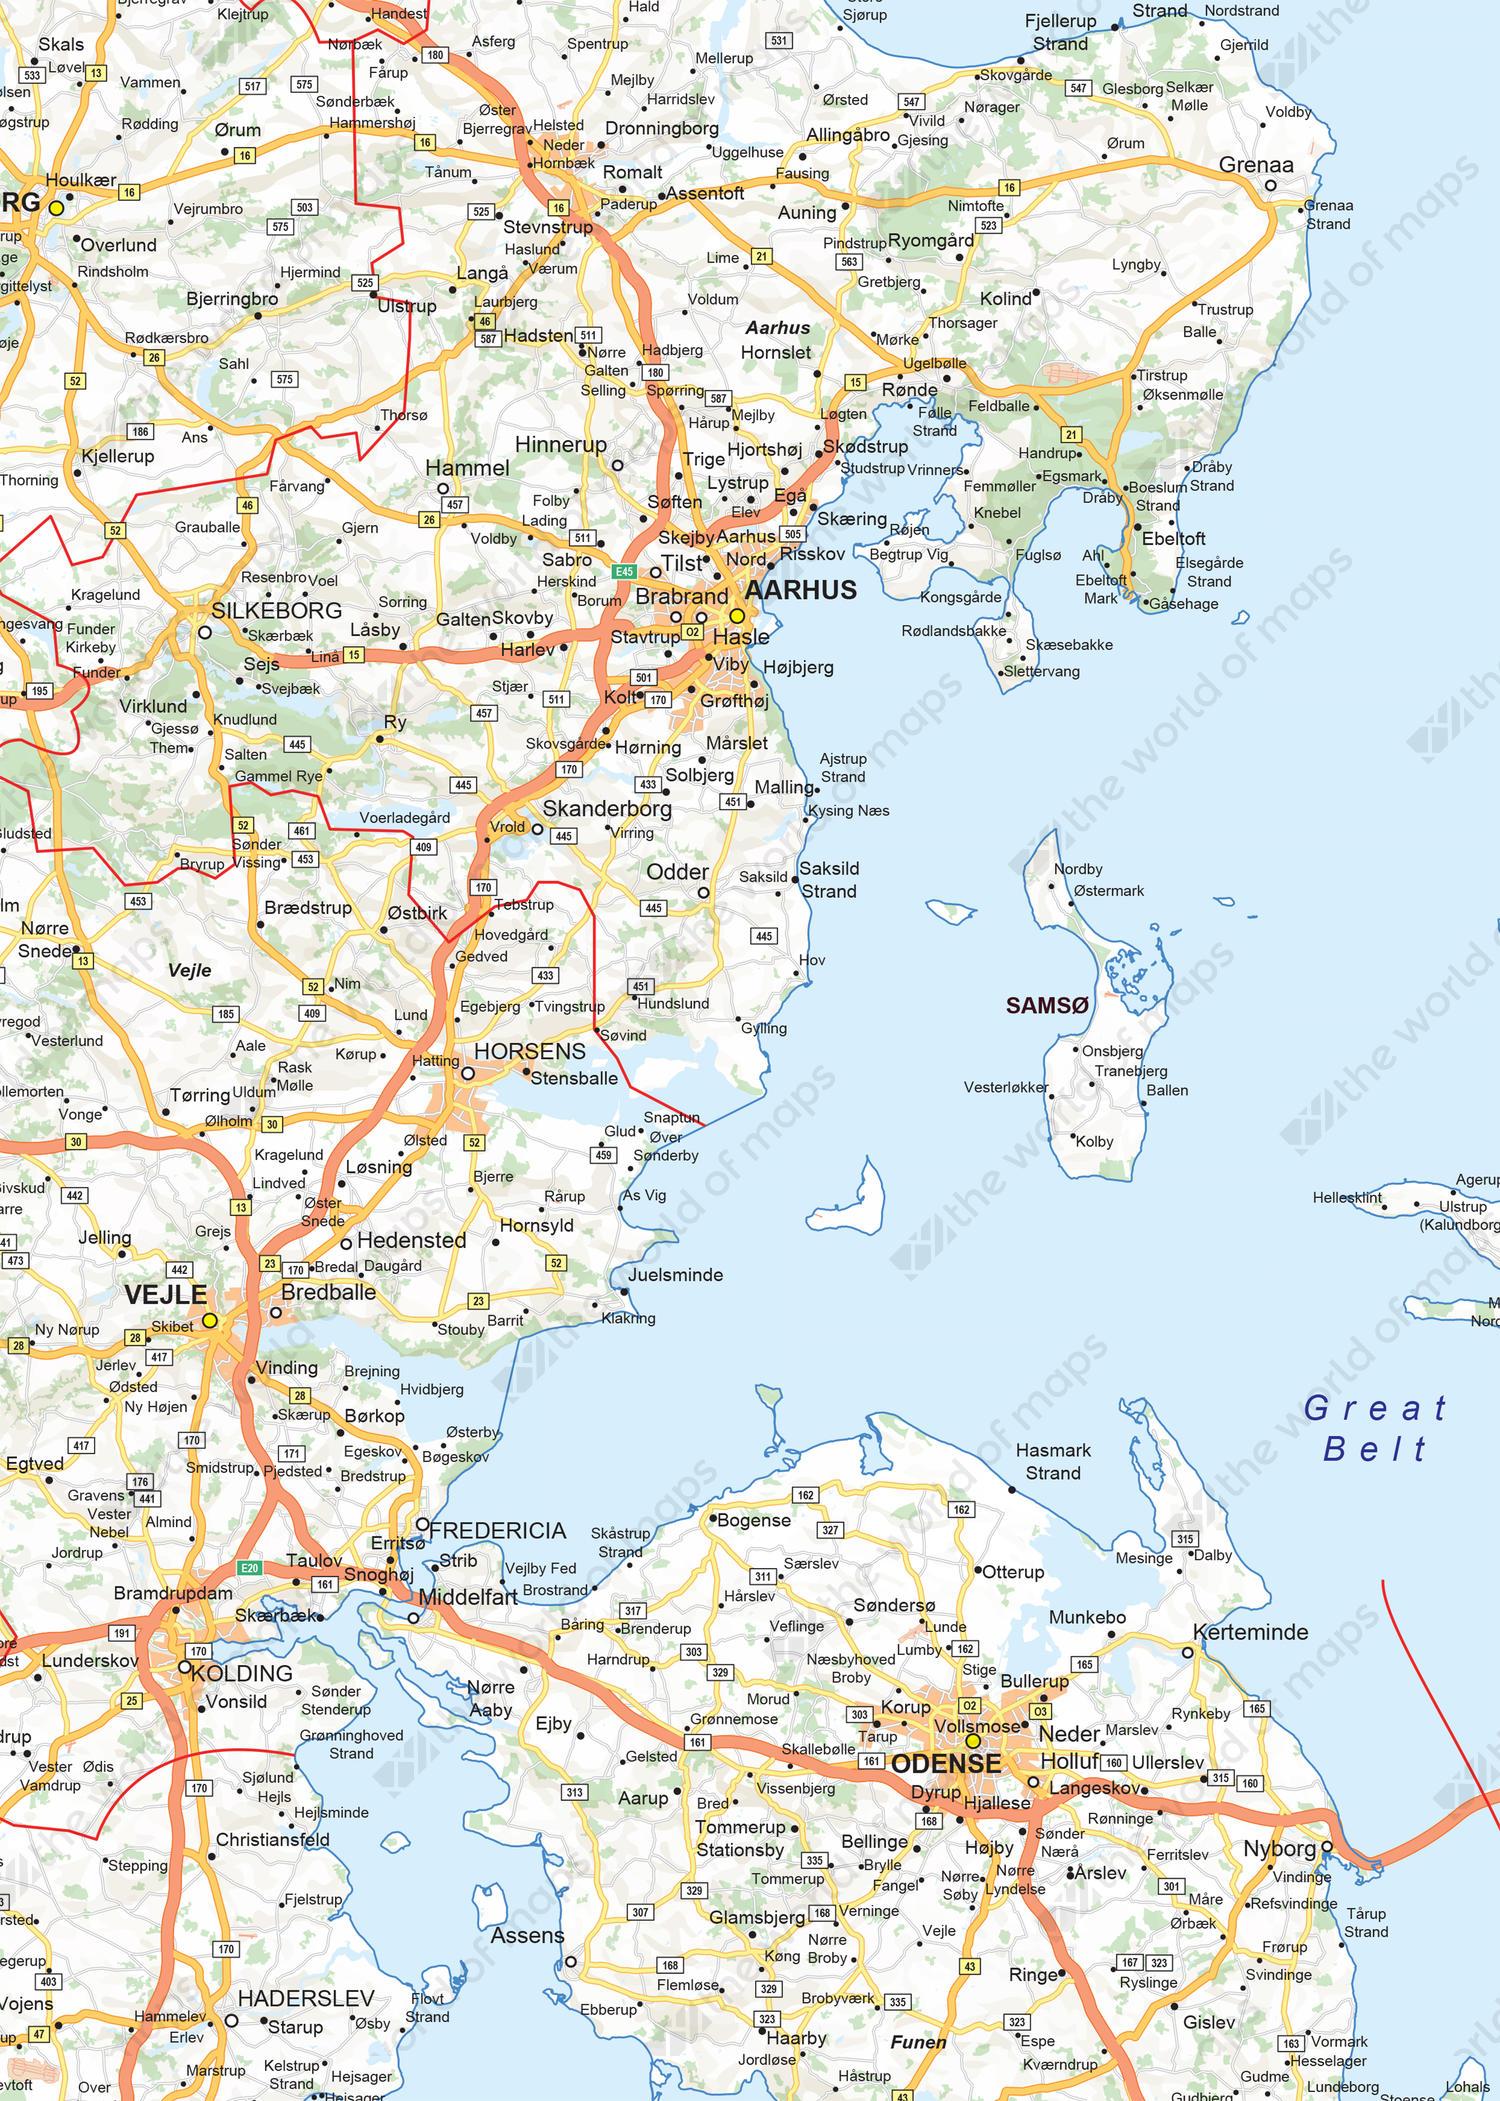 Digital Roadmap Denmark